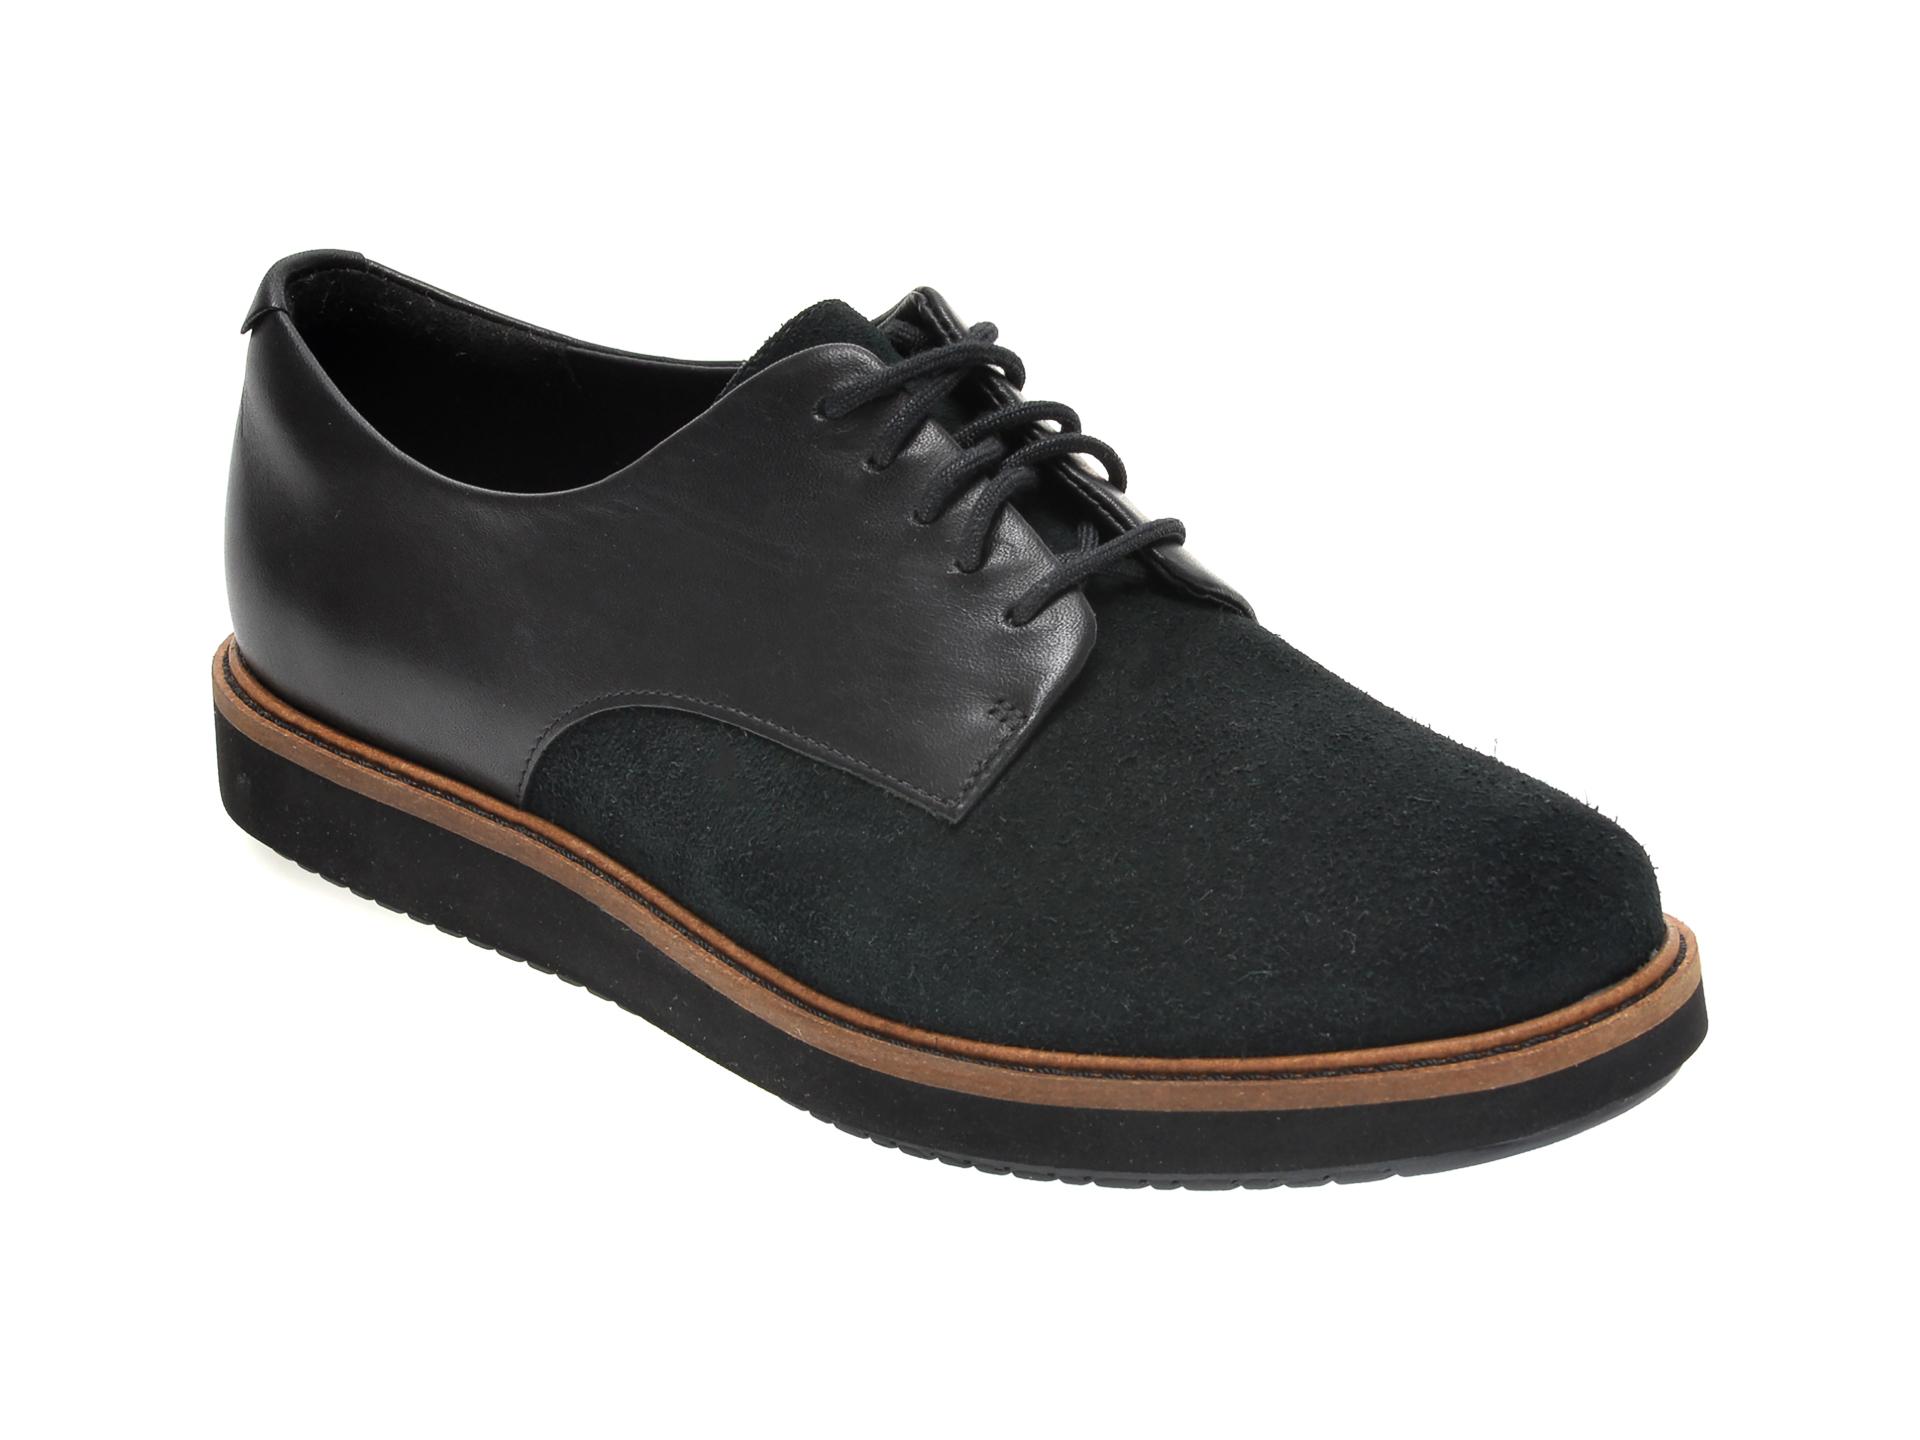 Pantofi CLARKS negri, GLICK DARBY, din piele naturala imagine